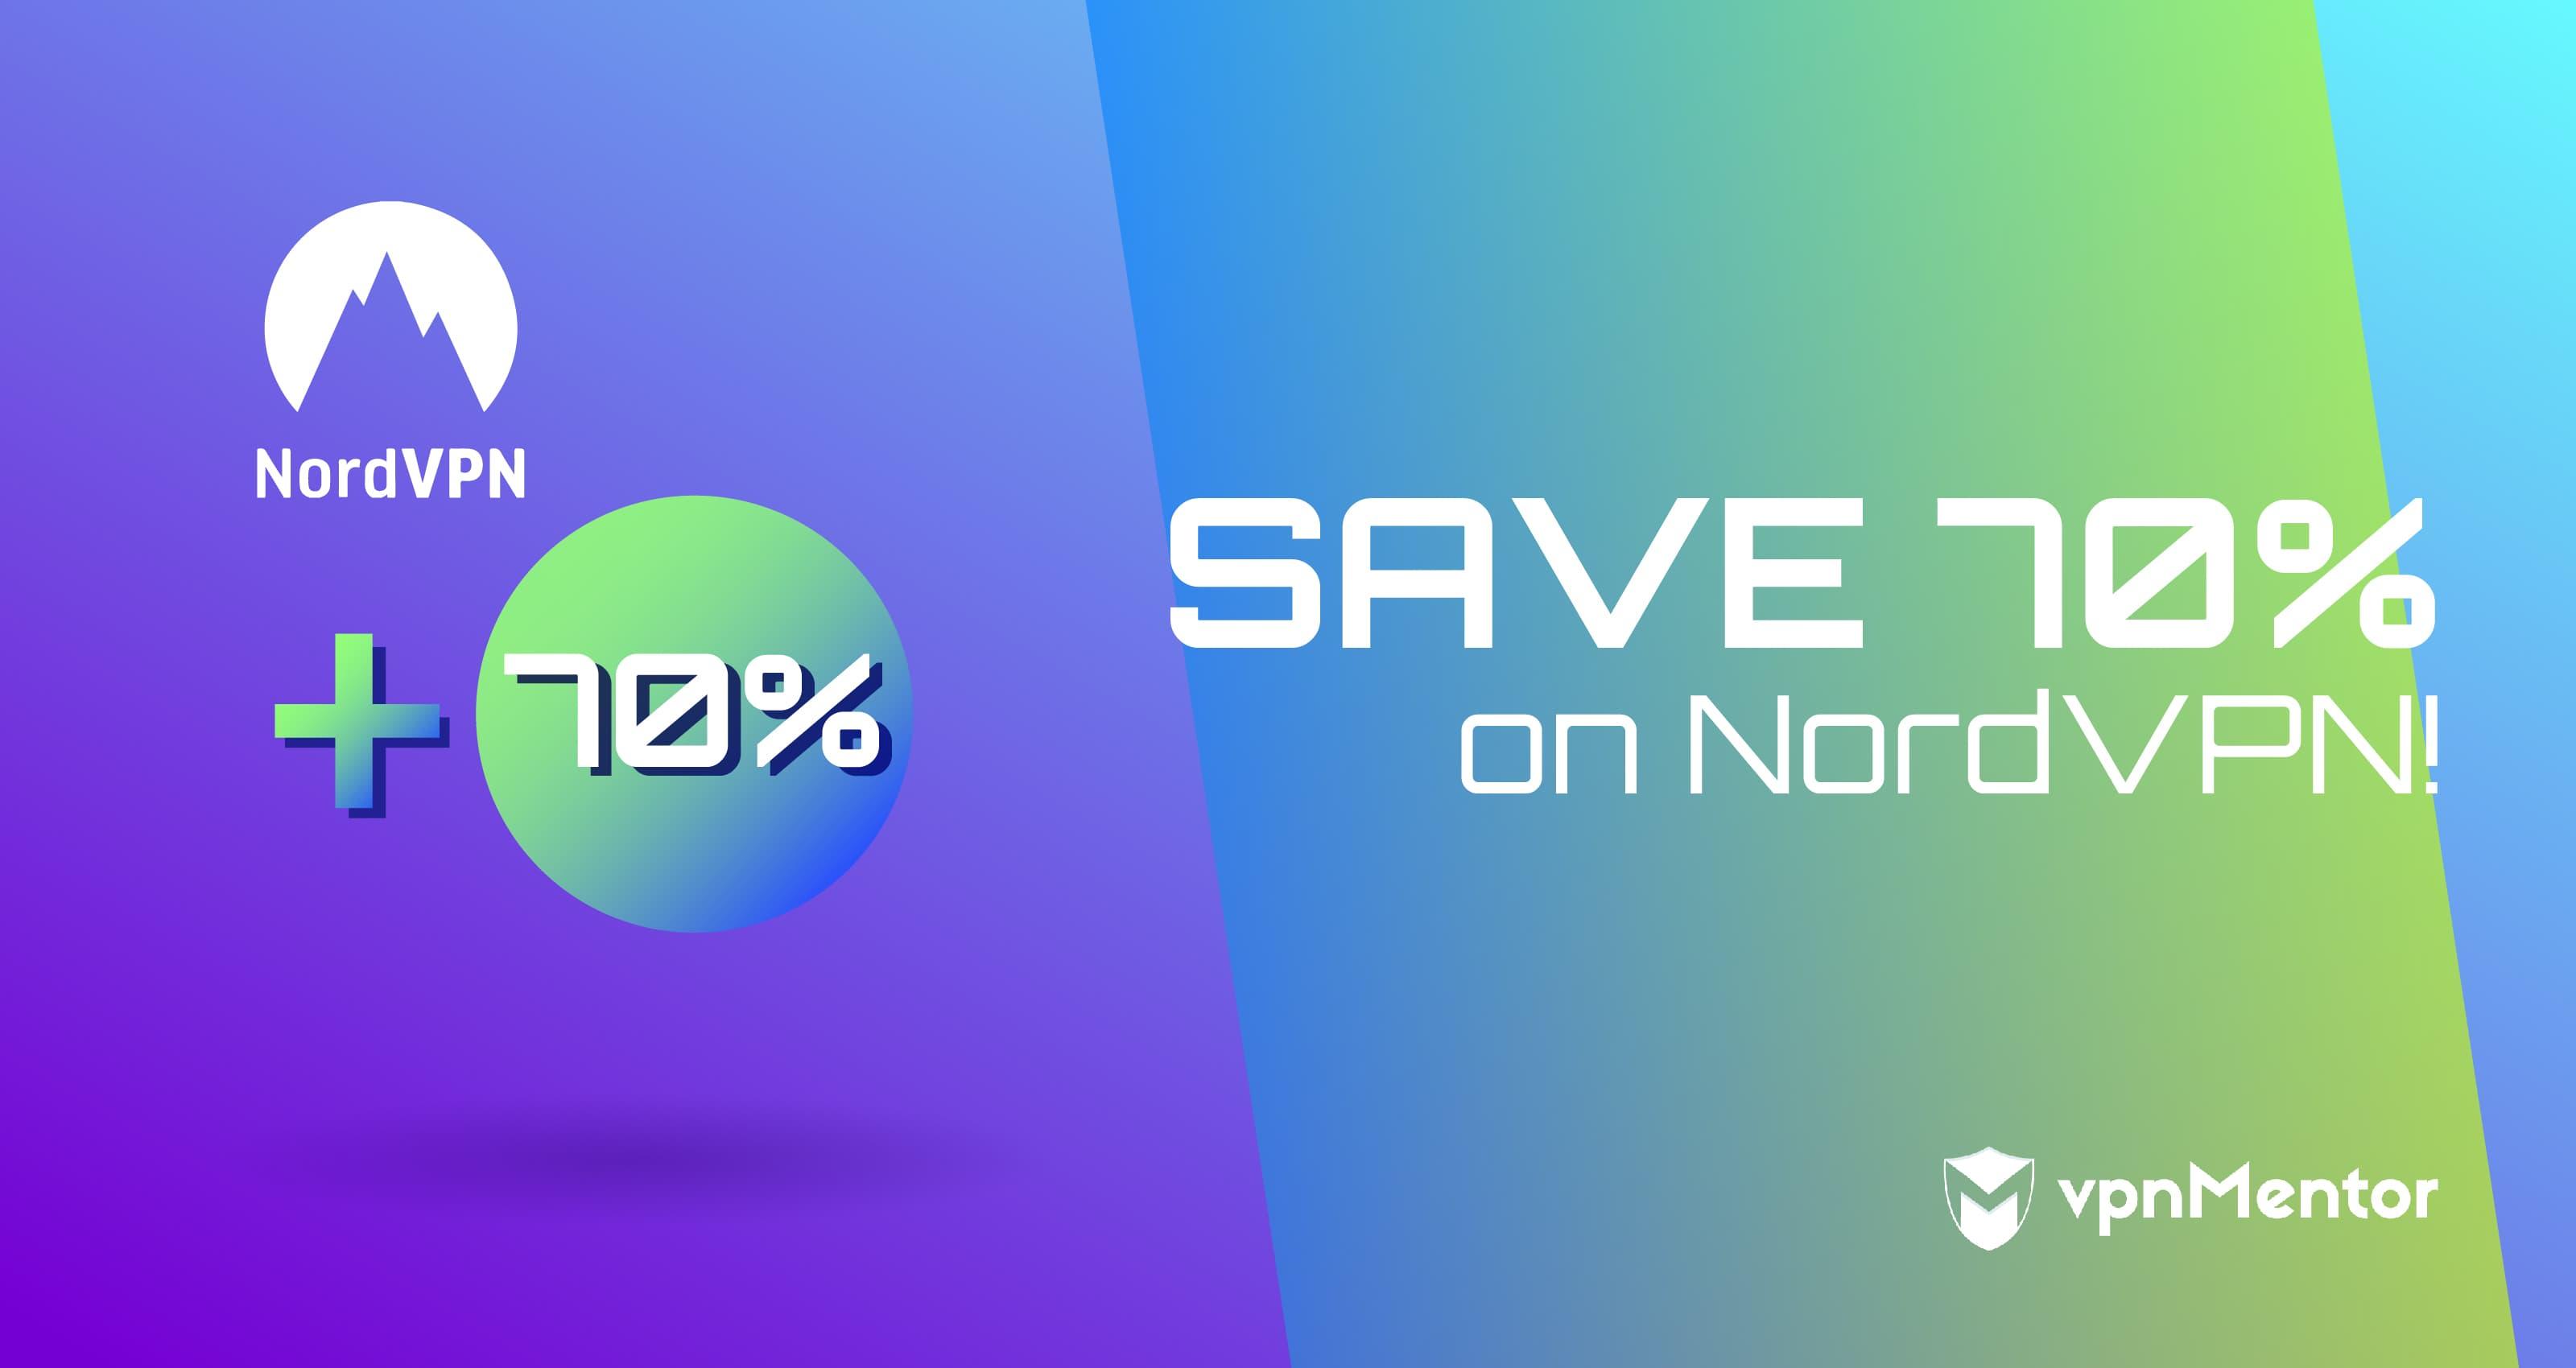 nordvpn 2 year coupon